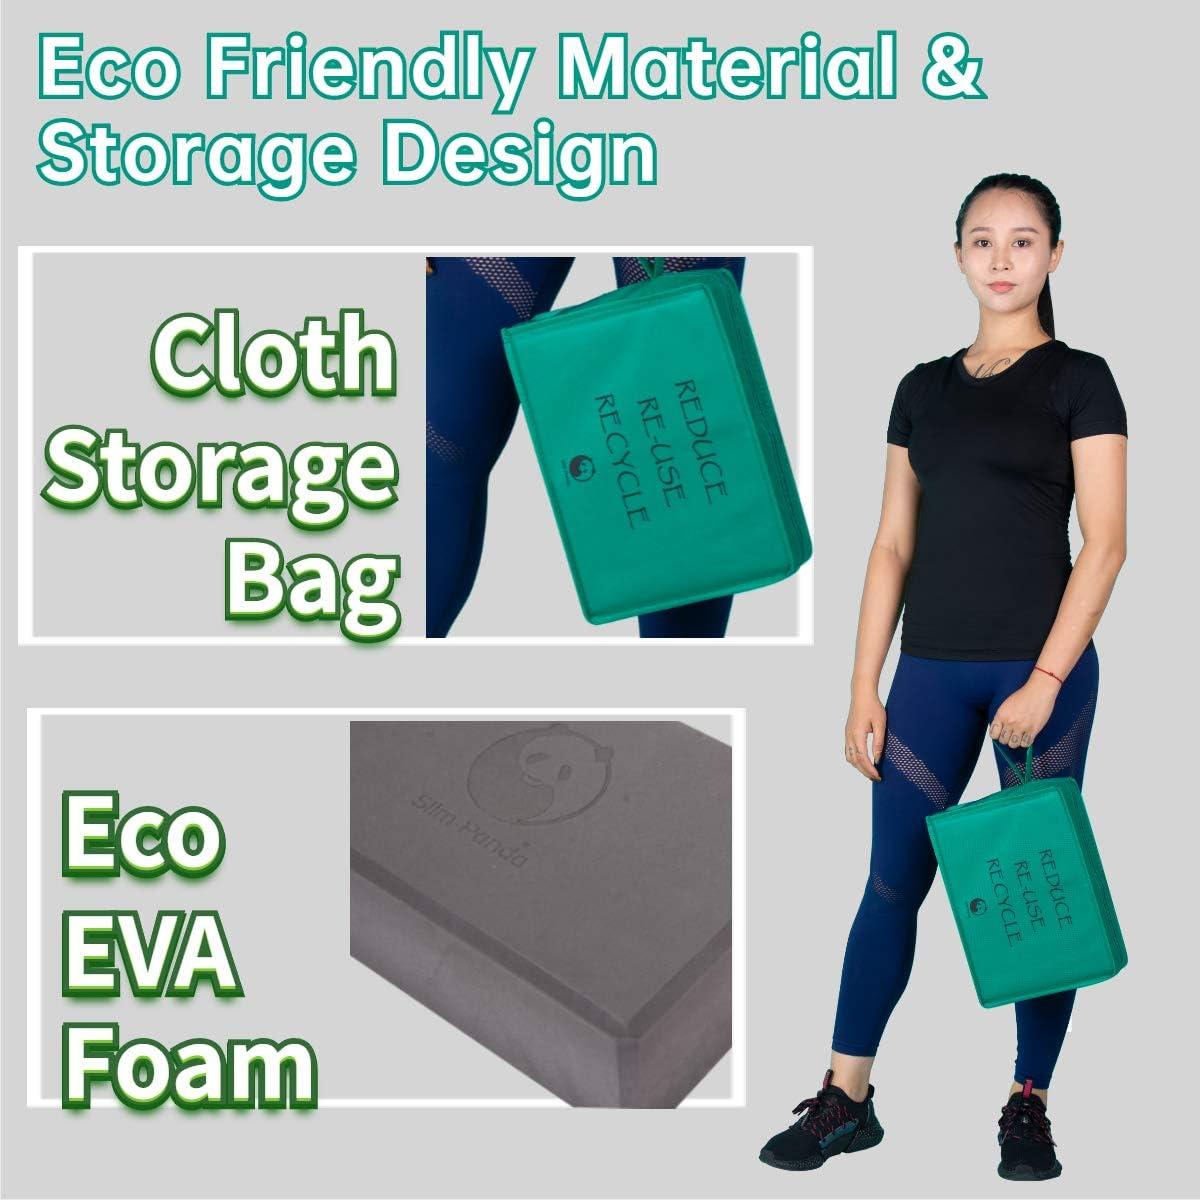 Slim Panda Sturdy 3x6x9 inch Foam EVA Yoga Blocks 2 Pack